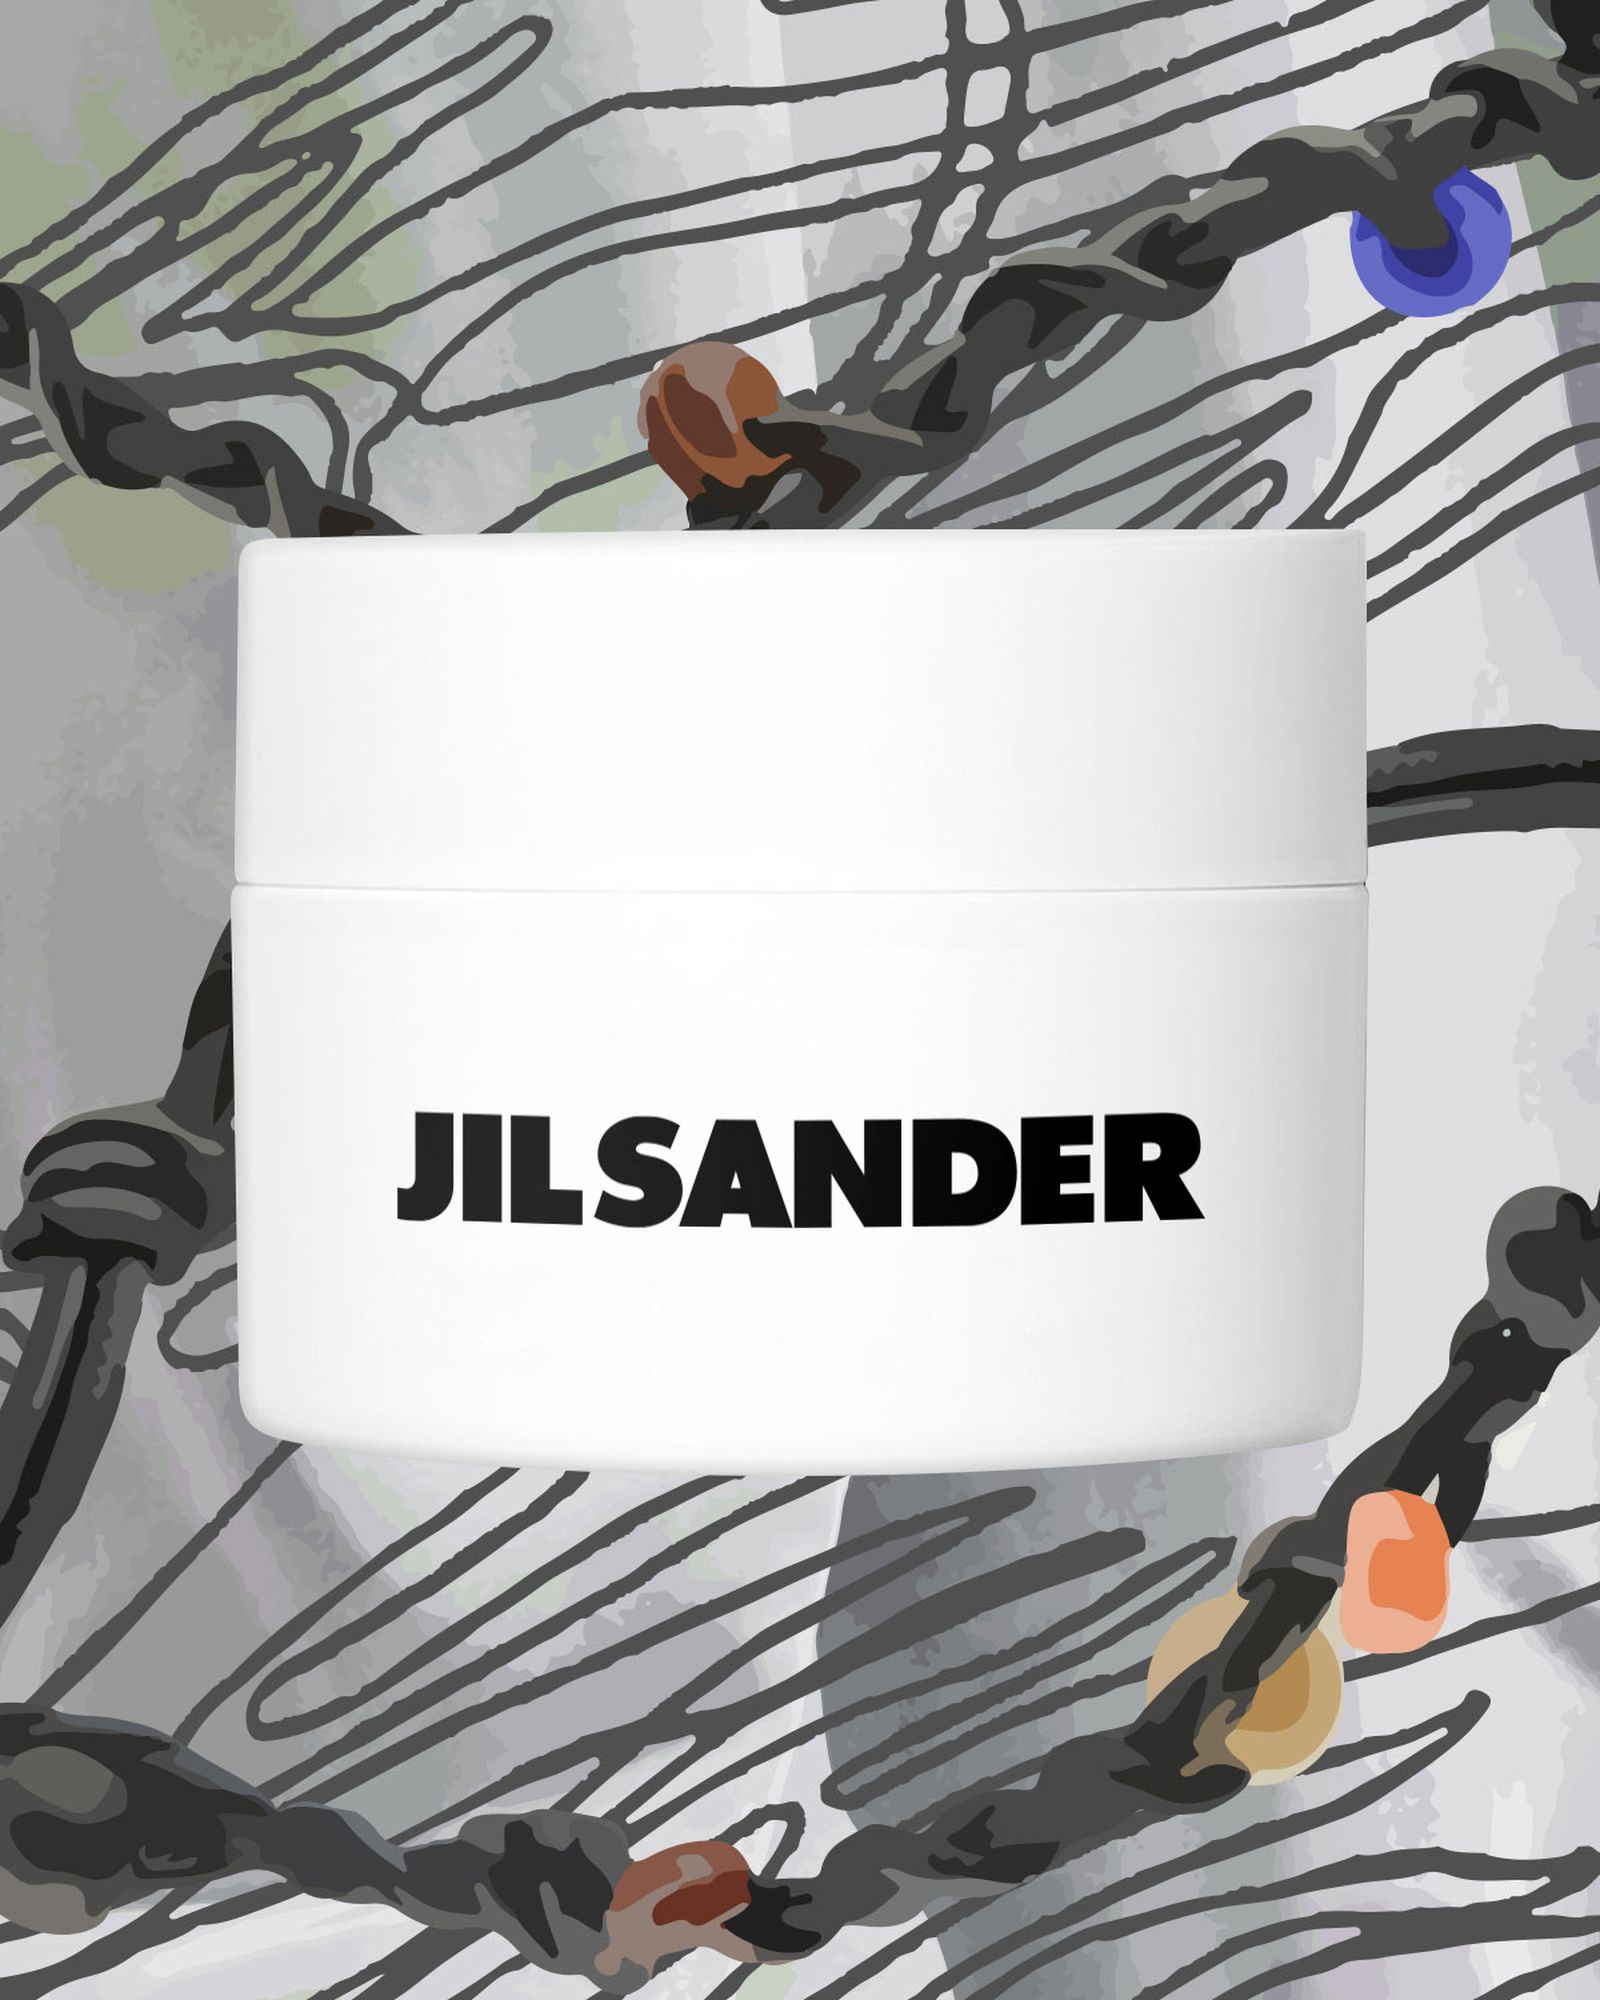 skincare-fashion-brands-Jil Sander_Dr. Barbara Sturm_1200x1500_dev01